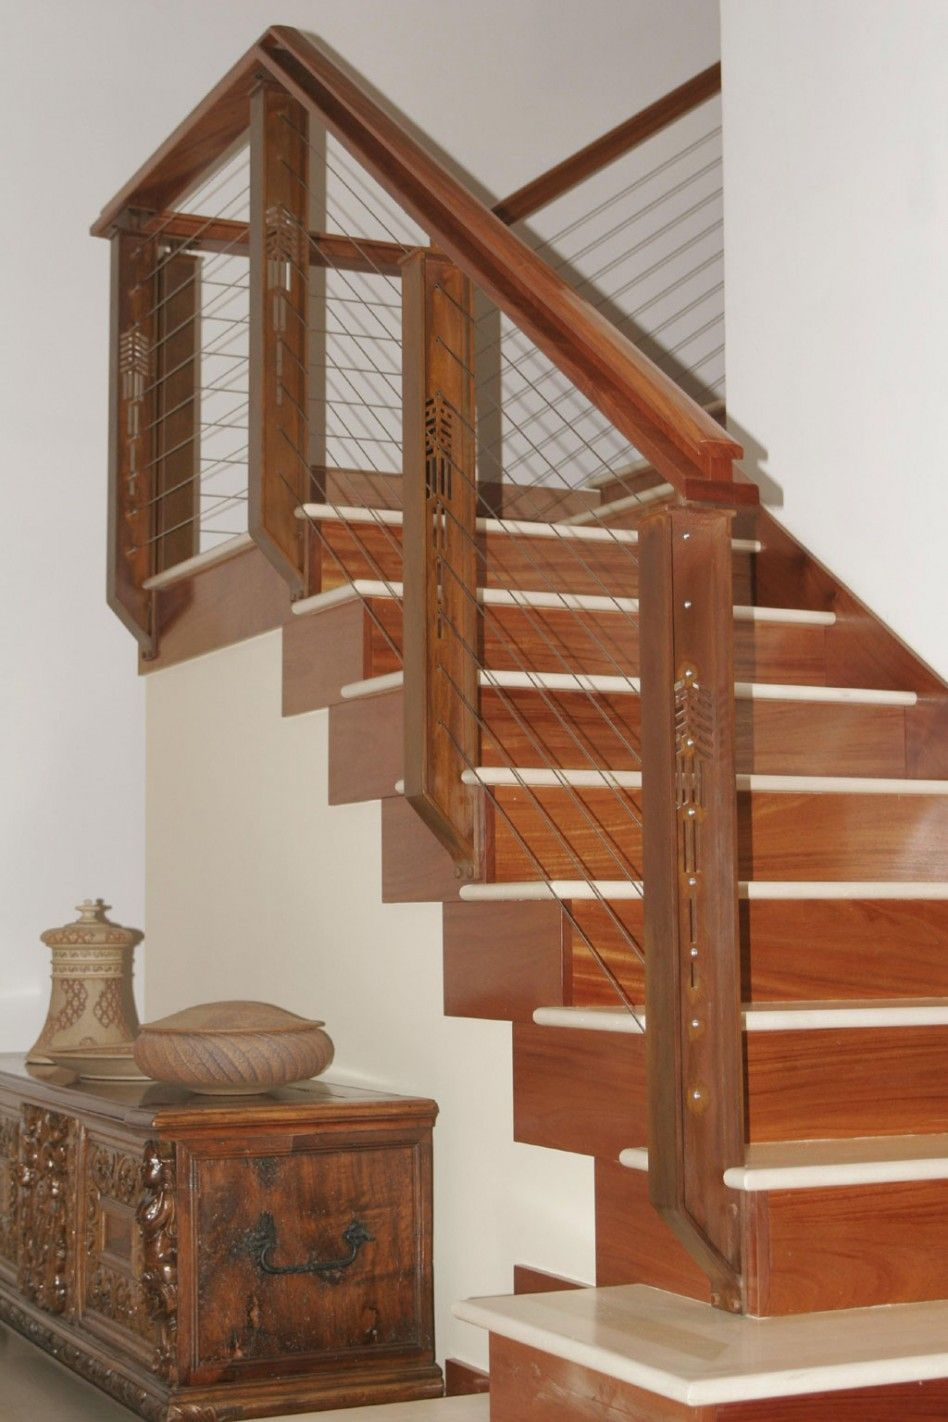 Other Design Breathtaking Home Interior Design Ideas Using Half